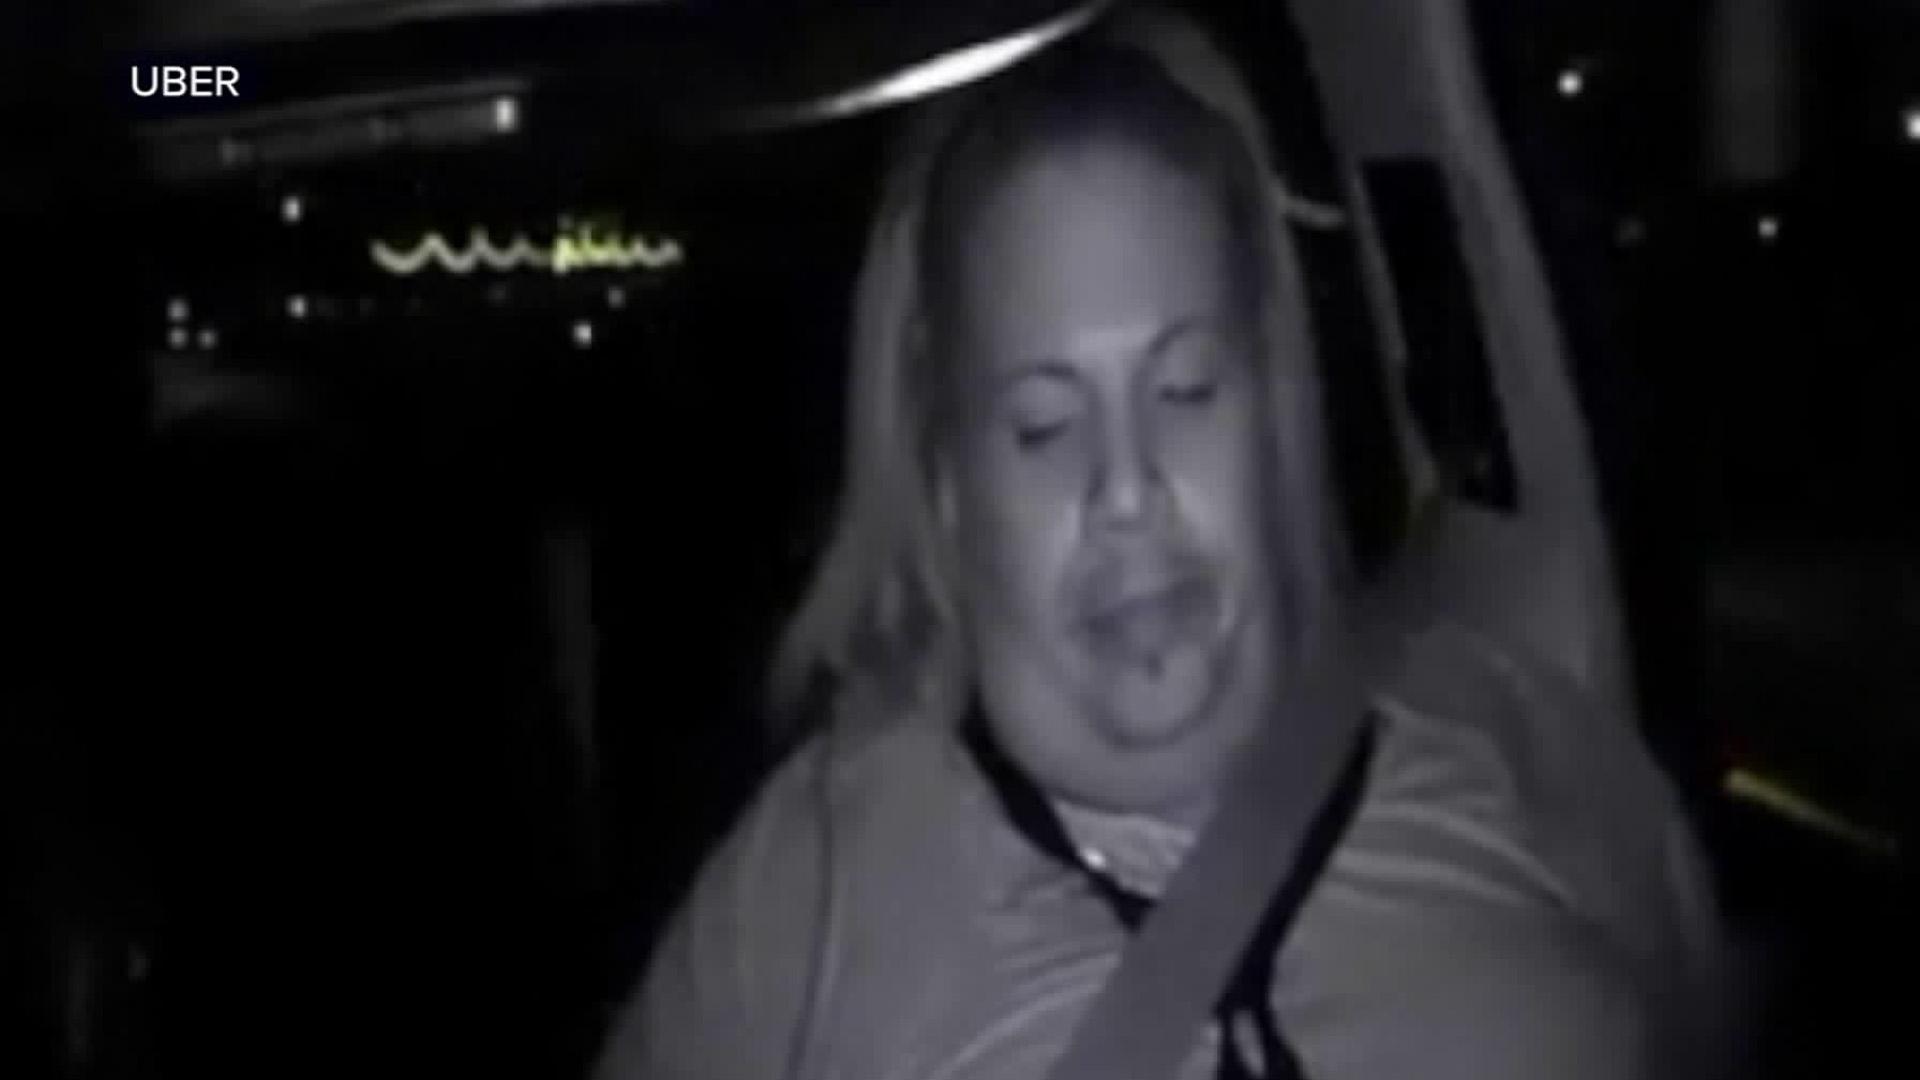 Uber operator Rafaela Vasquez is seen in this dashcam footage released by Uber.